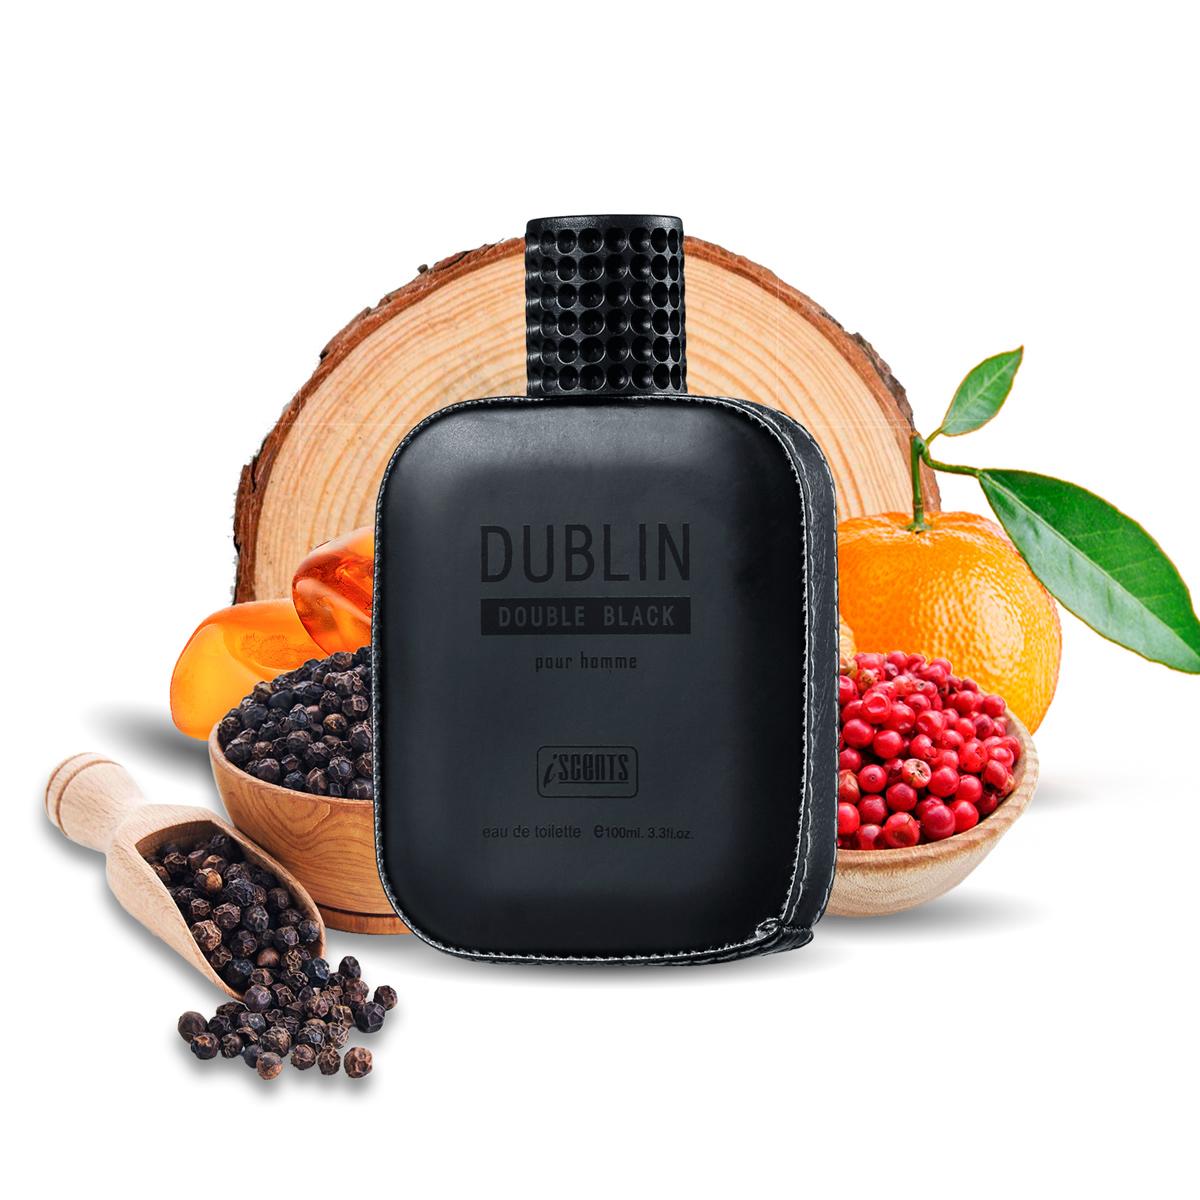 Kit 2 Perfumes Importados Fantasia e Dublin I Scents